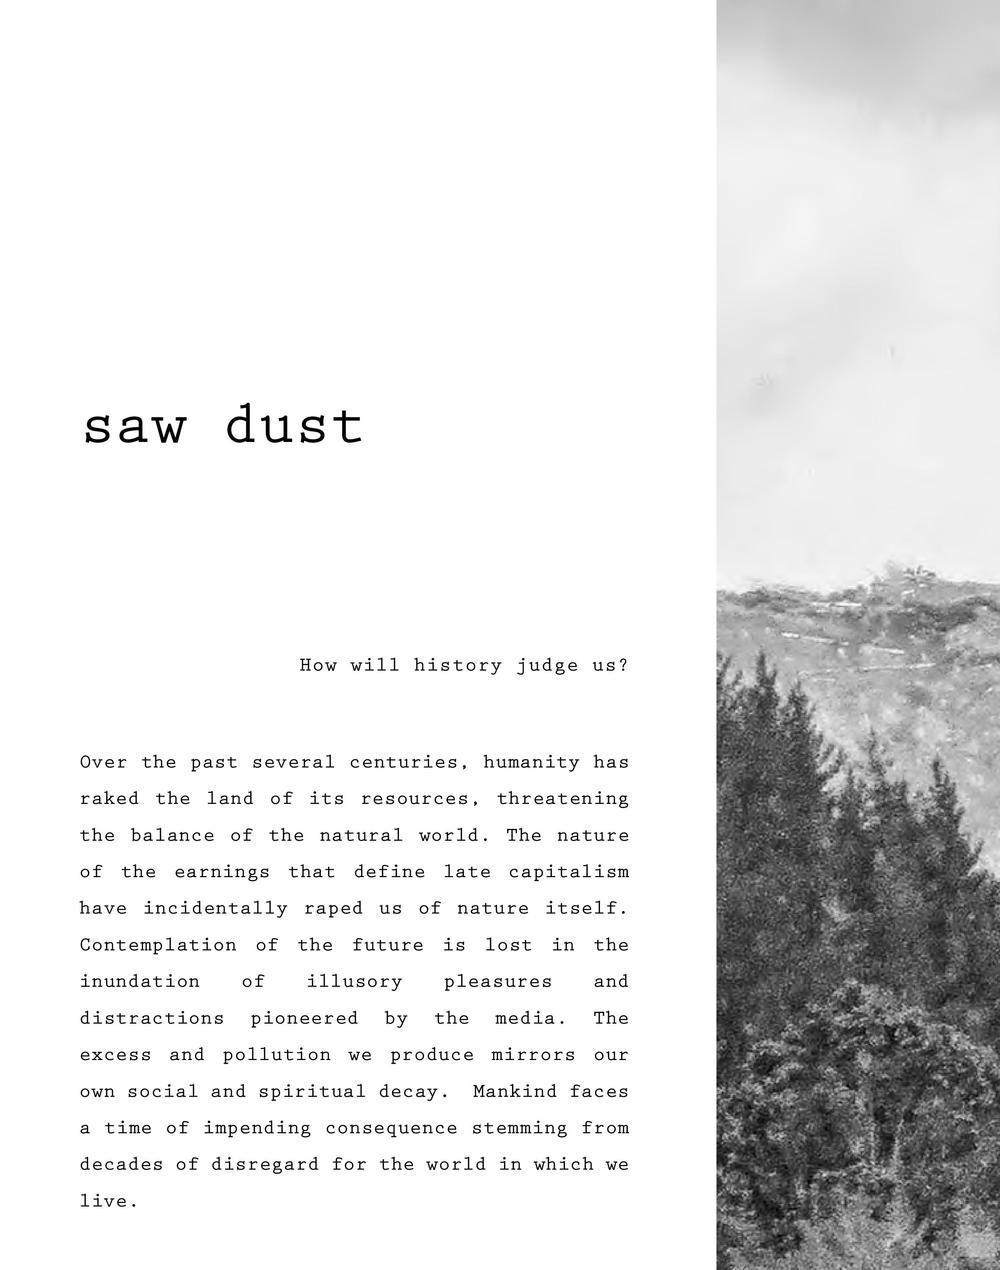 SawDust-Catalog-HEYDT-email-page-007.jpg